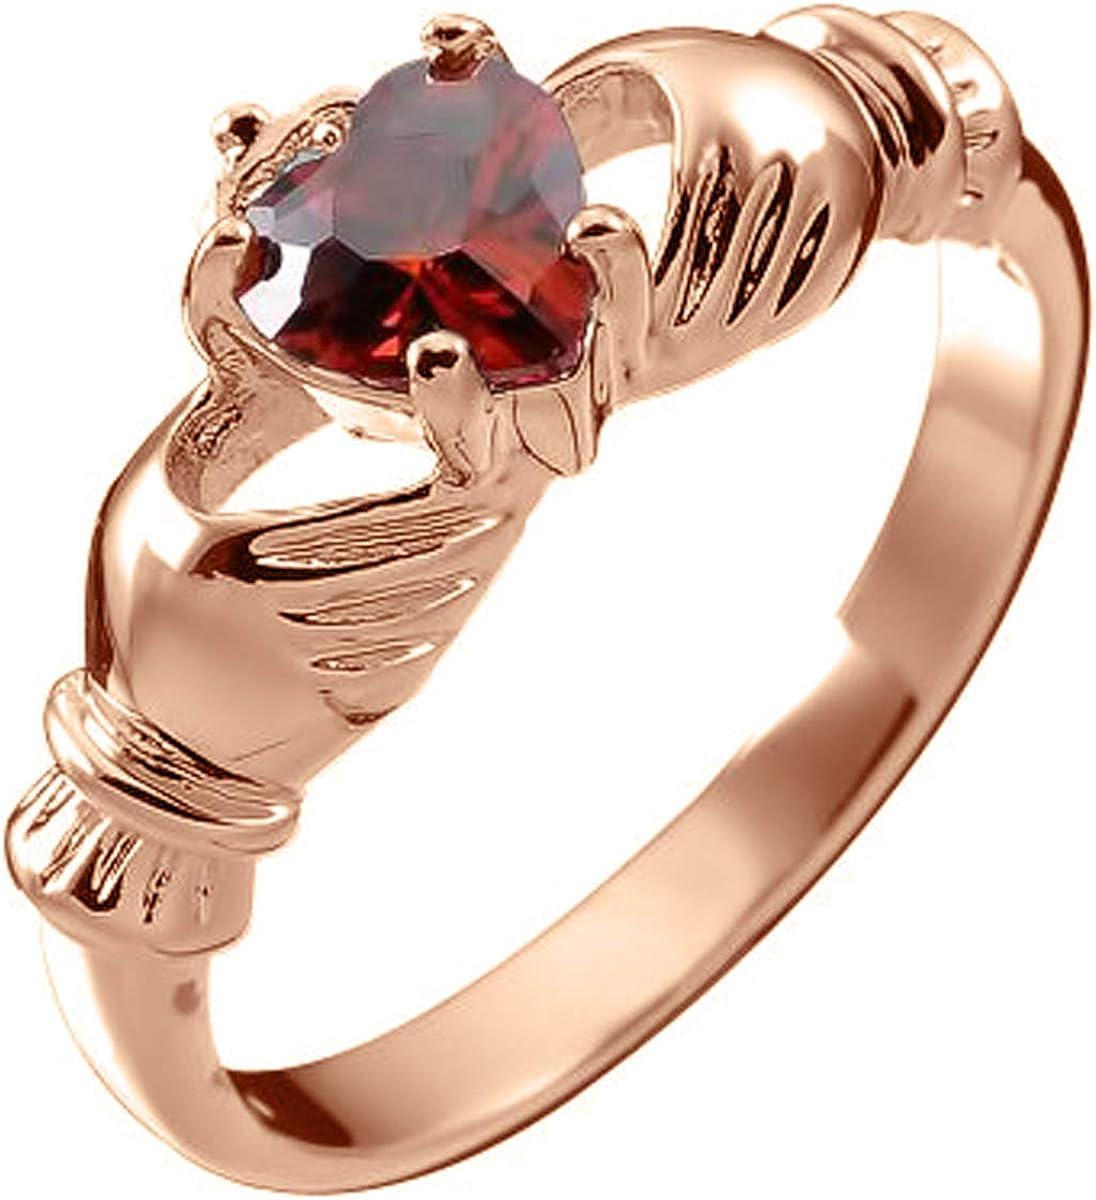 Único En Rojo Corazón Anillo Ajustable declaración de resina enorme hecho a mano Rubí Fab